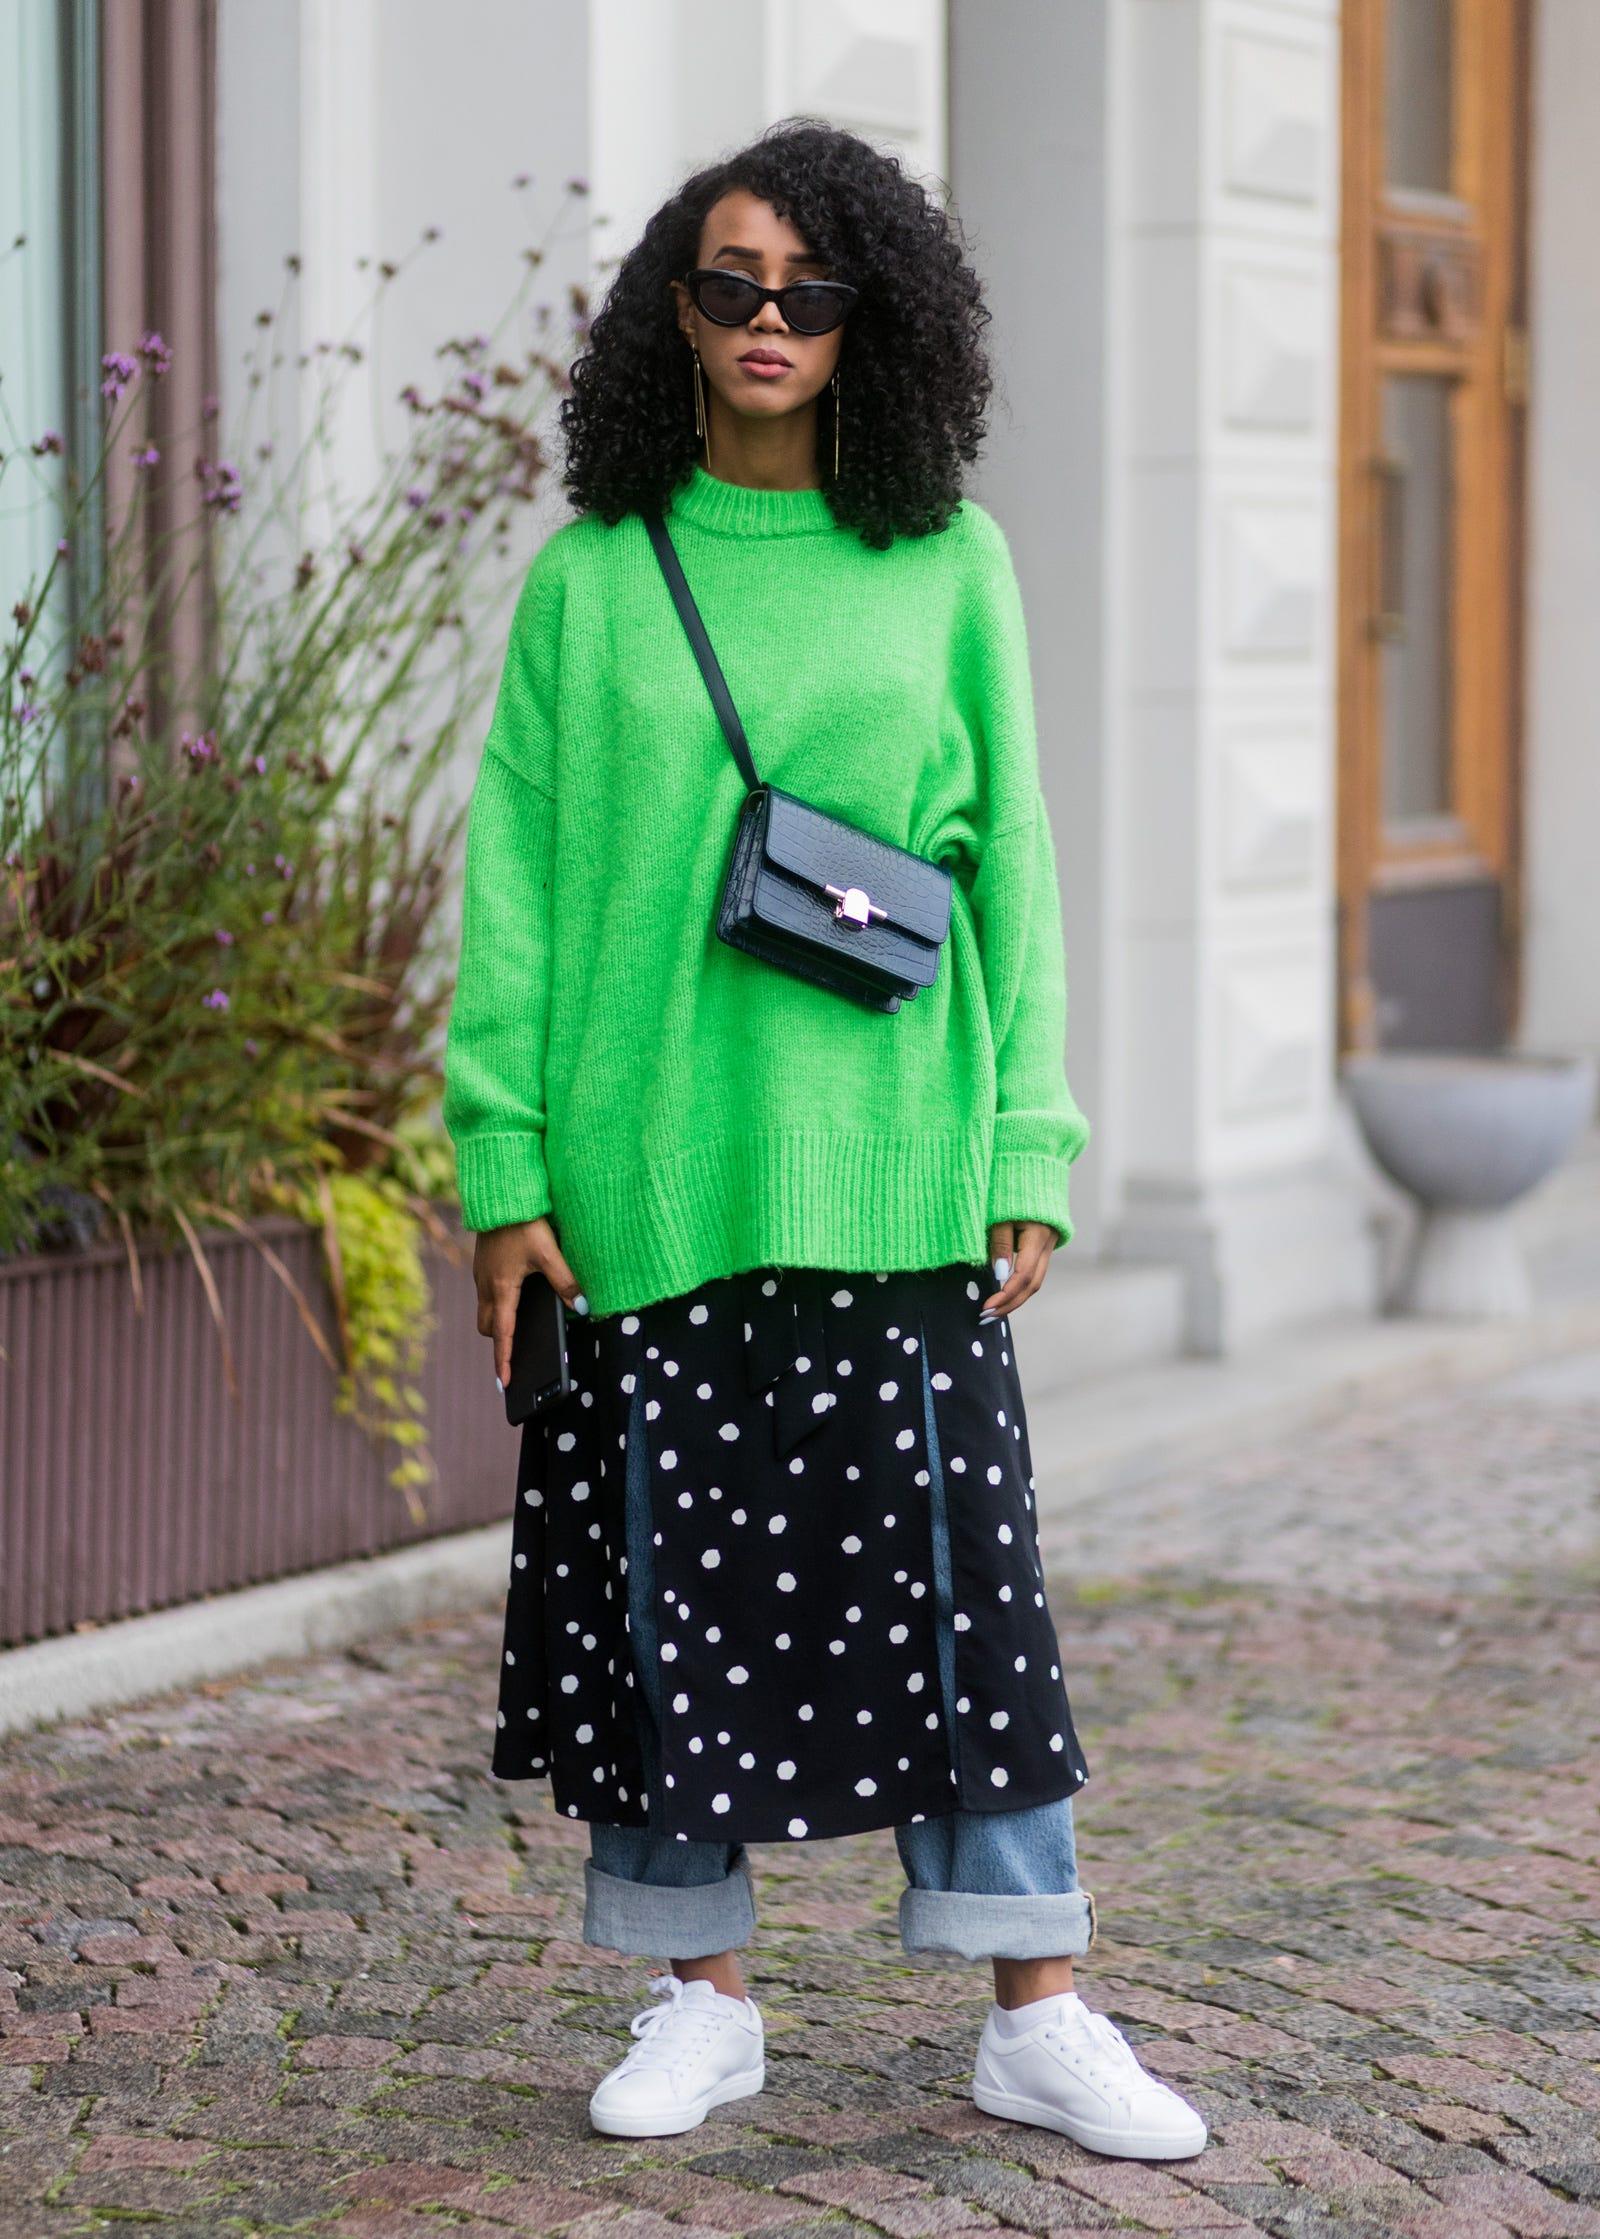 deba992e336 5 Ways To Wear Polka Dots In 2018